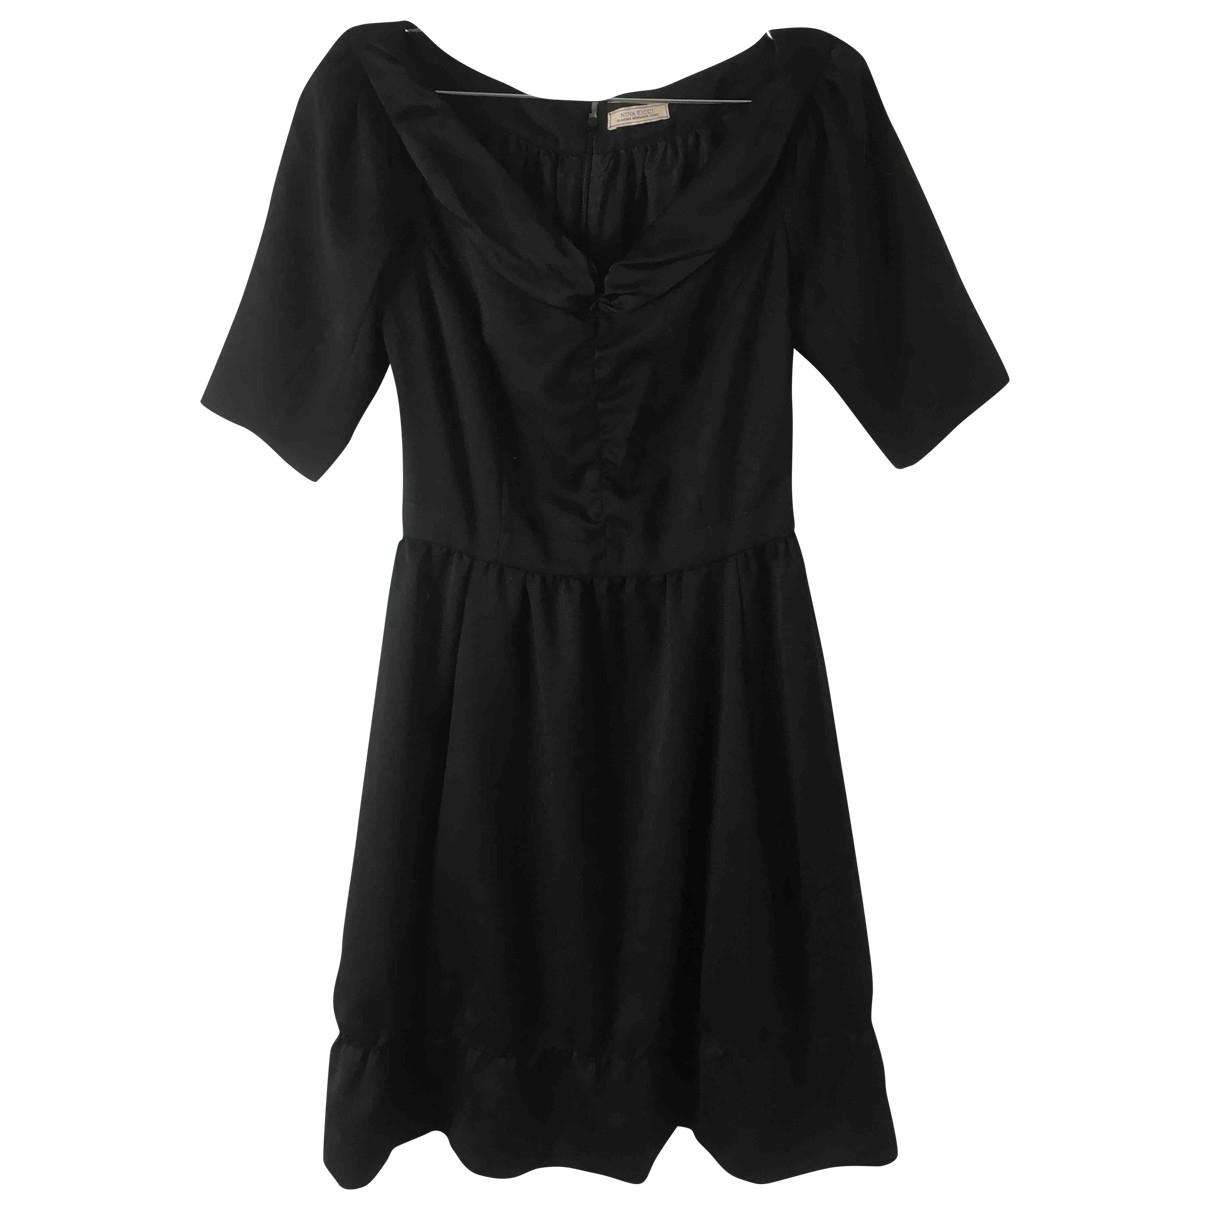 Nina Ricci \N Kleid in  Schwarz Wolle